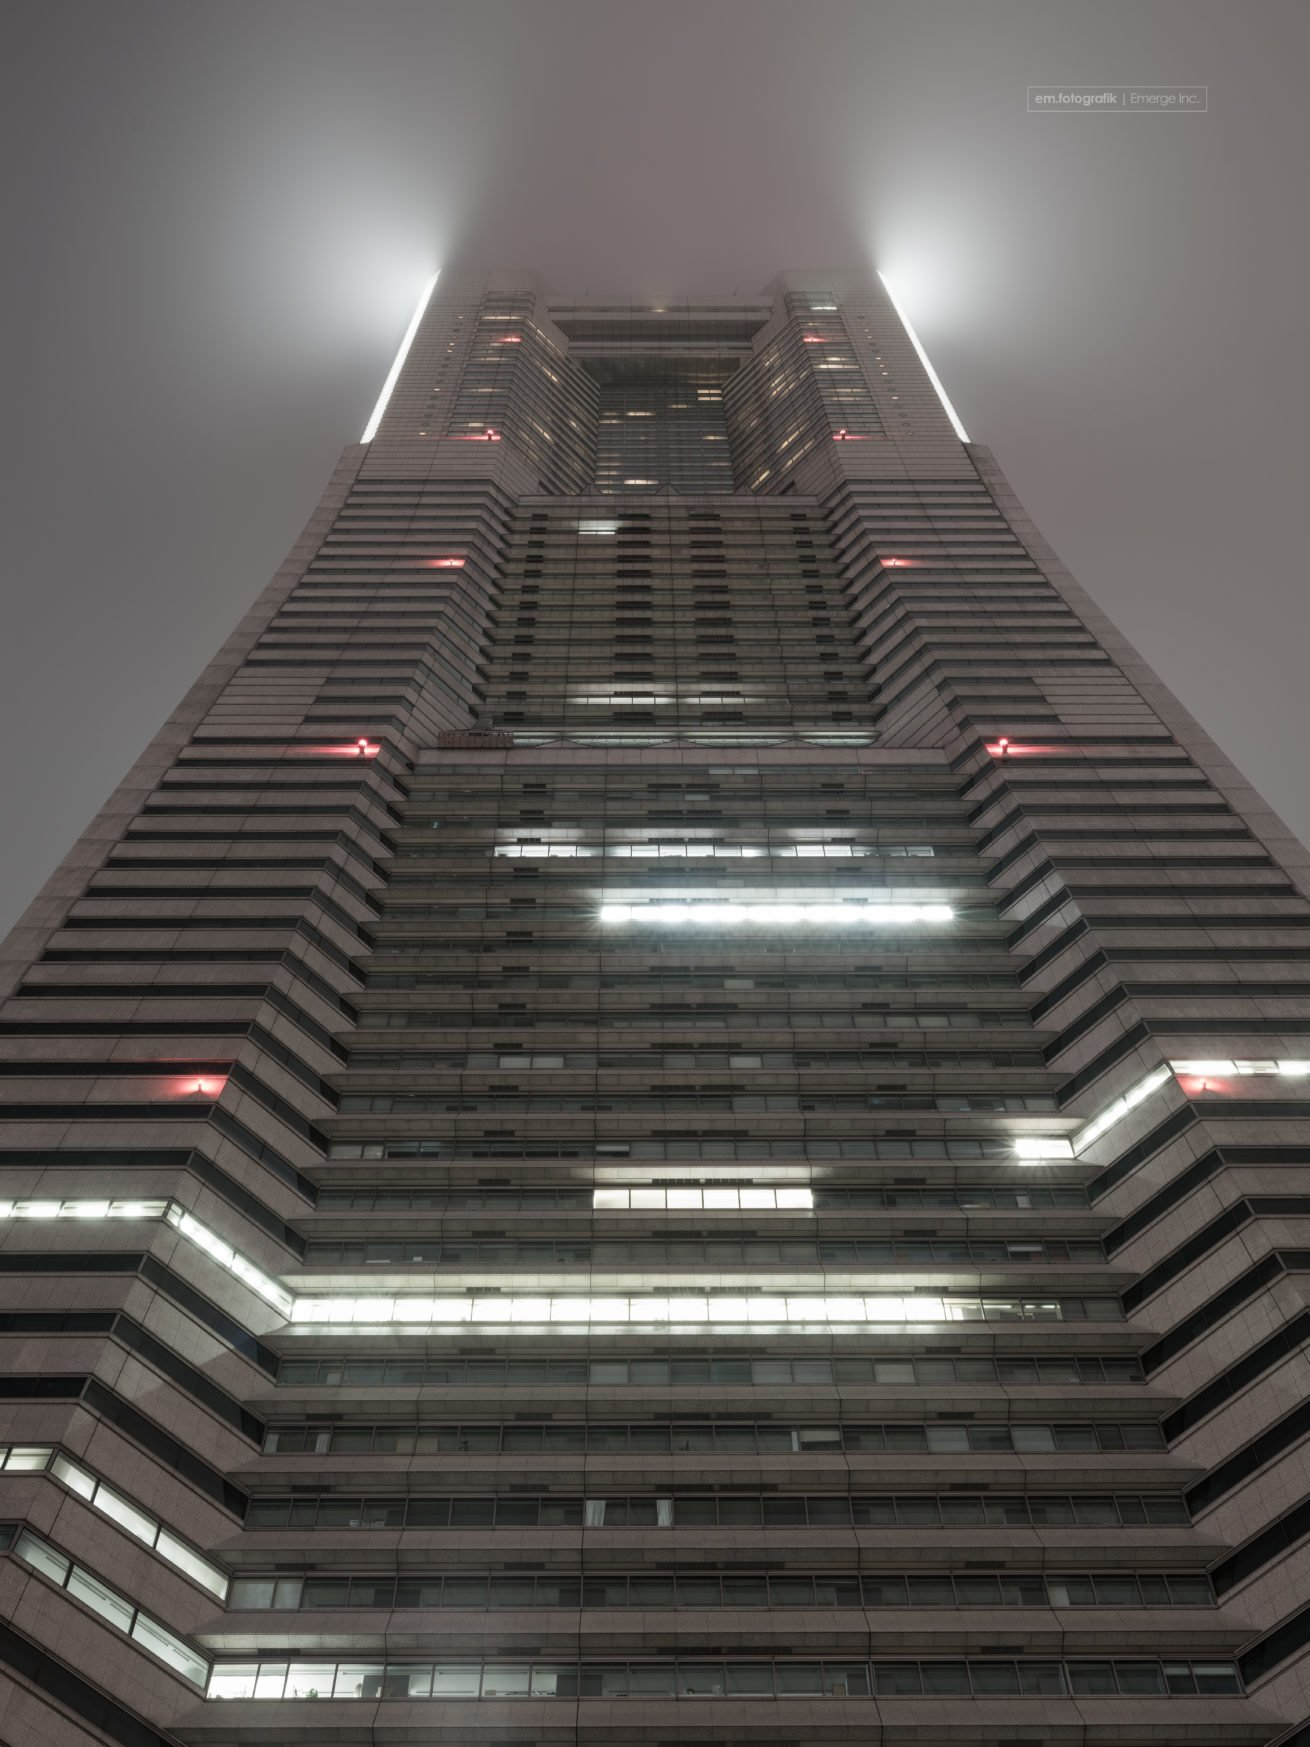 _EM94861-Edit-Landmark-Tower-Color-WM-FULL